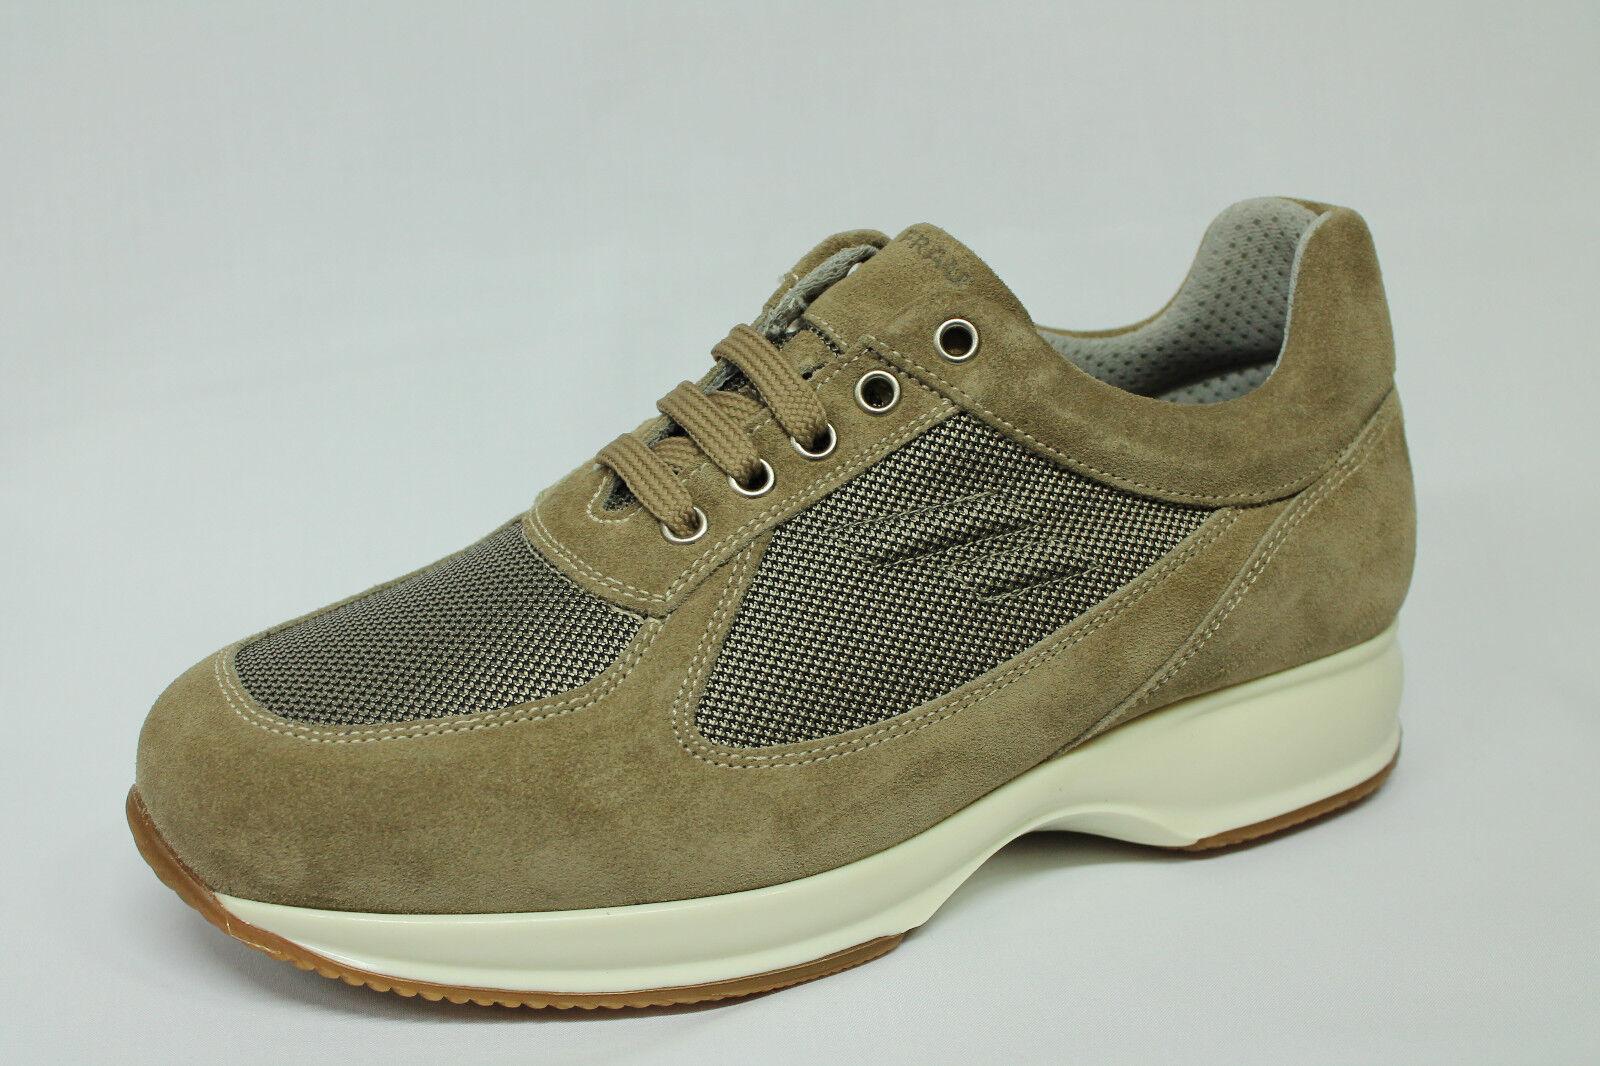 Sneakers Frau 24G4 24A4 beige tipo Hogan Interactive listino - 20%